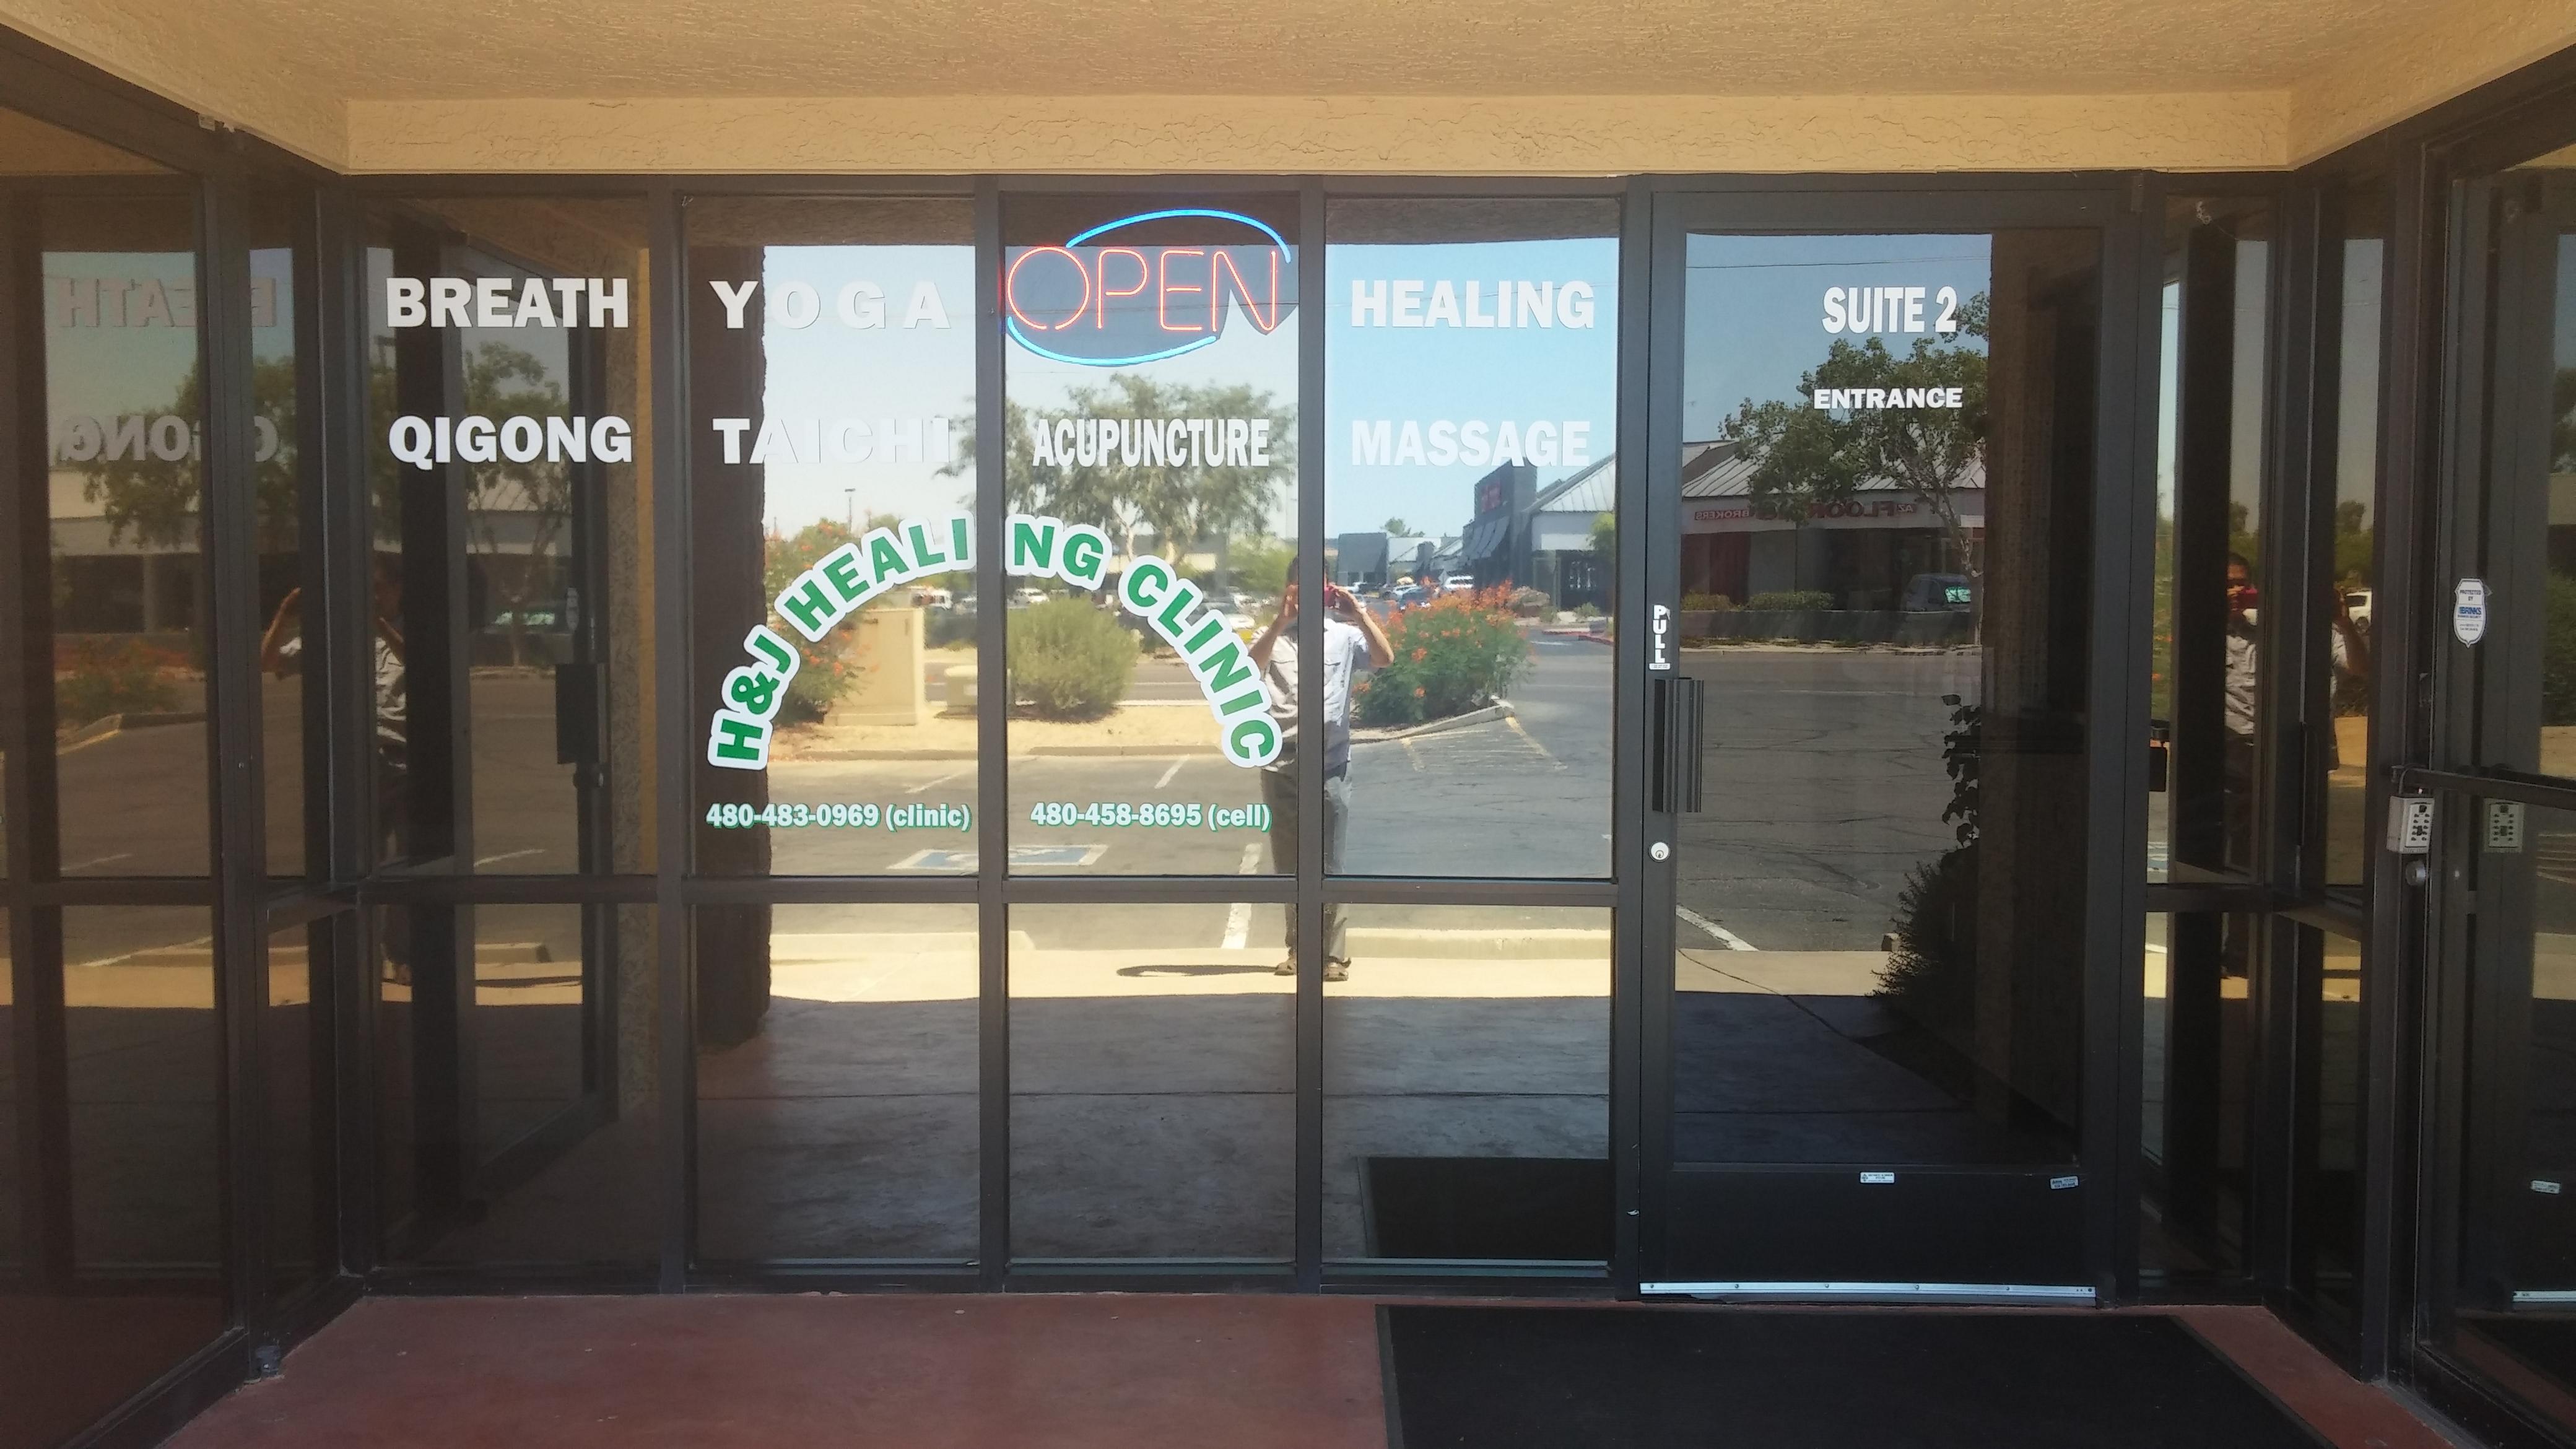 HNJ Healing Clinic image 27